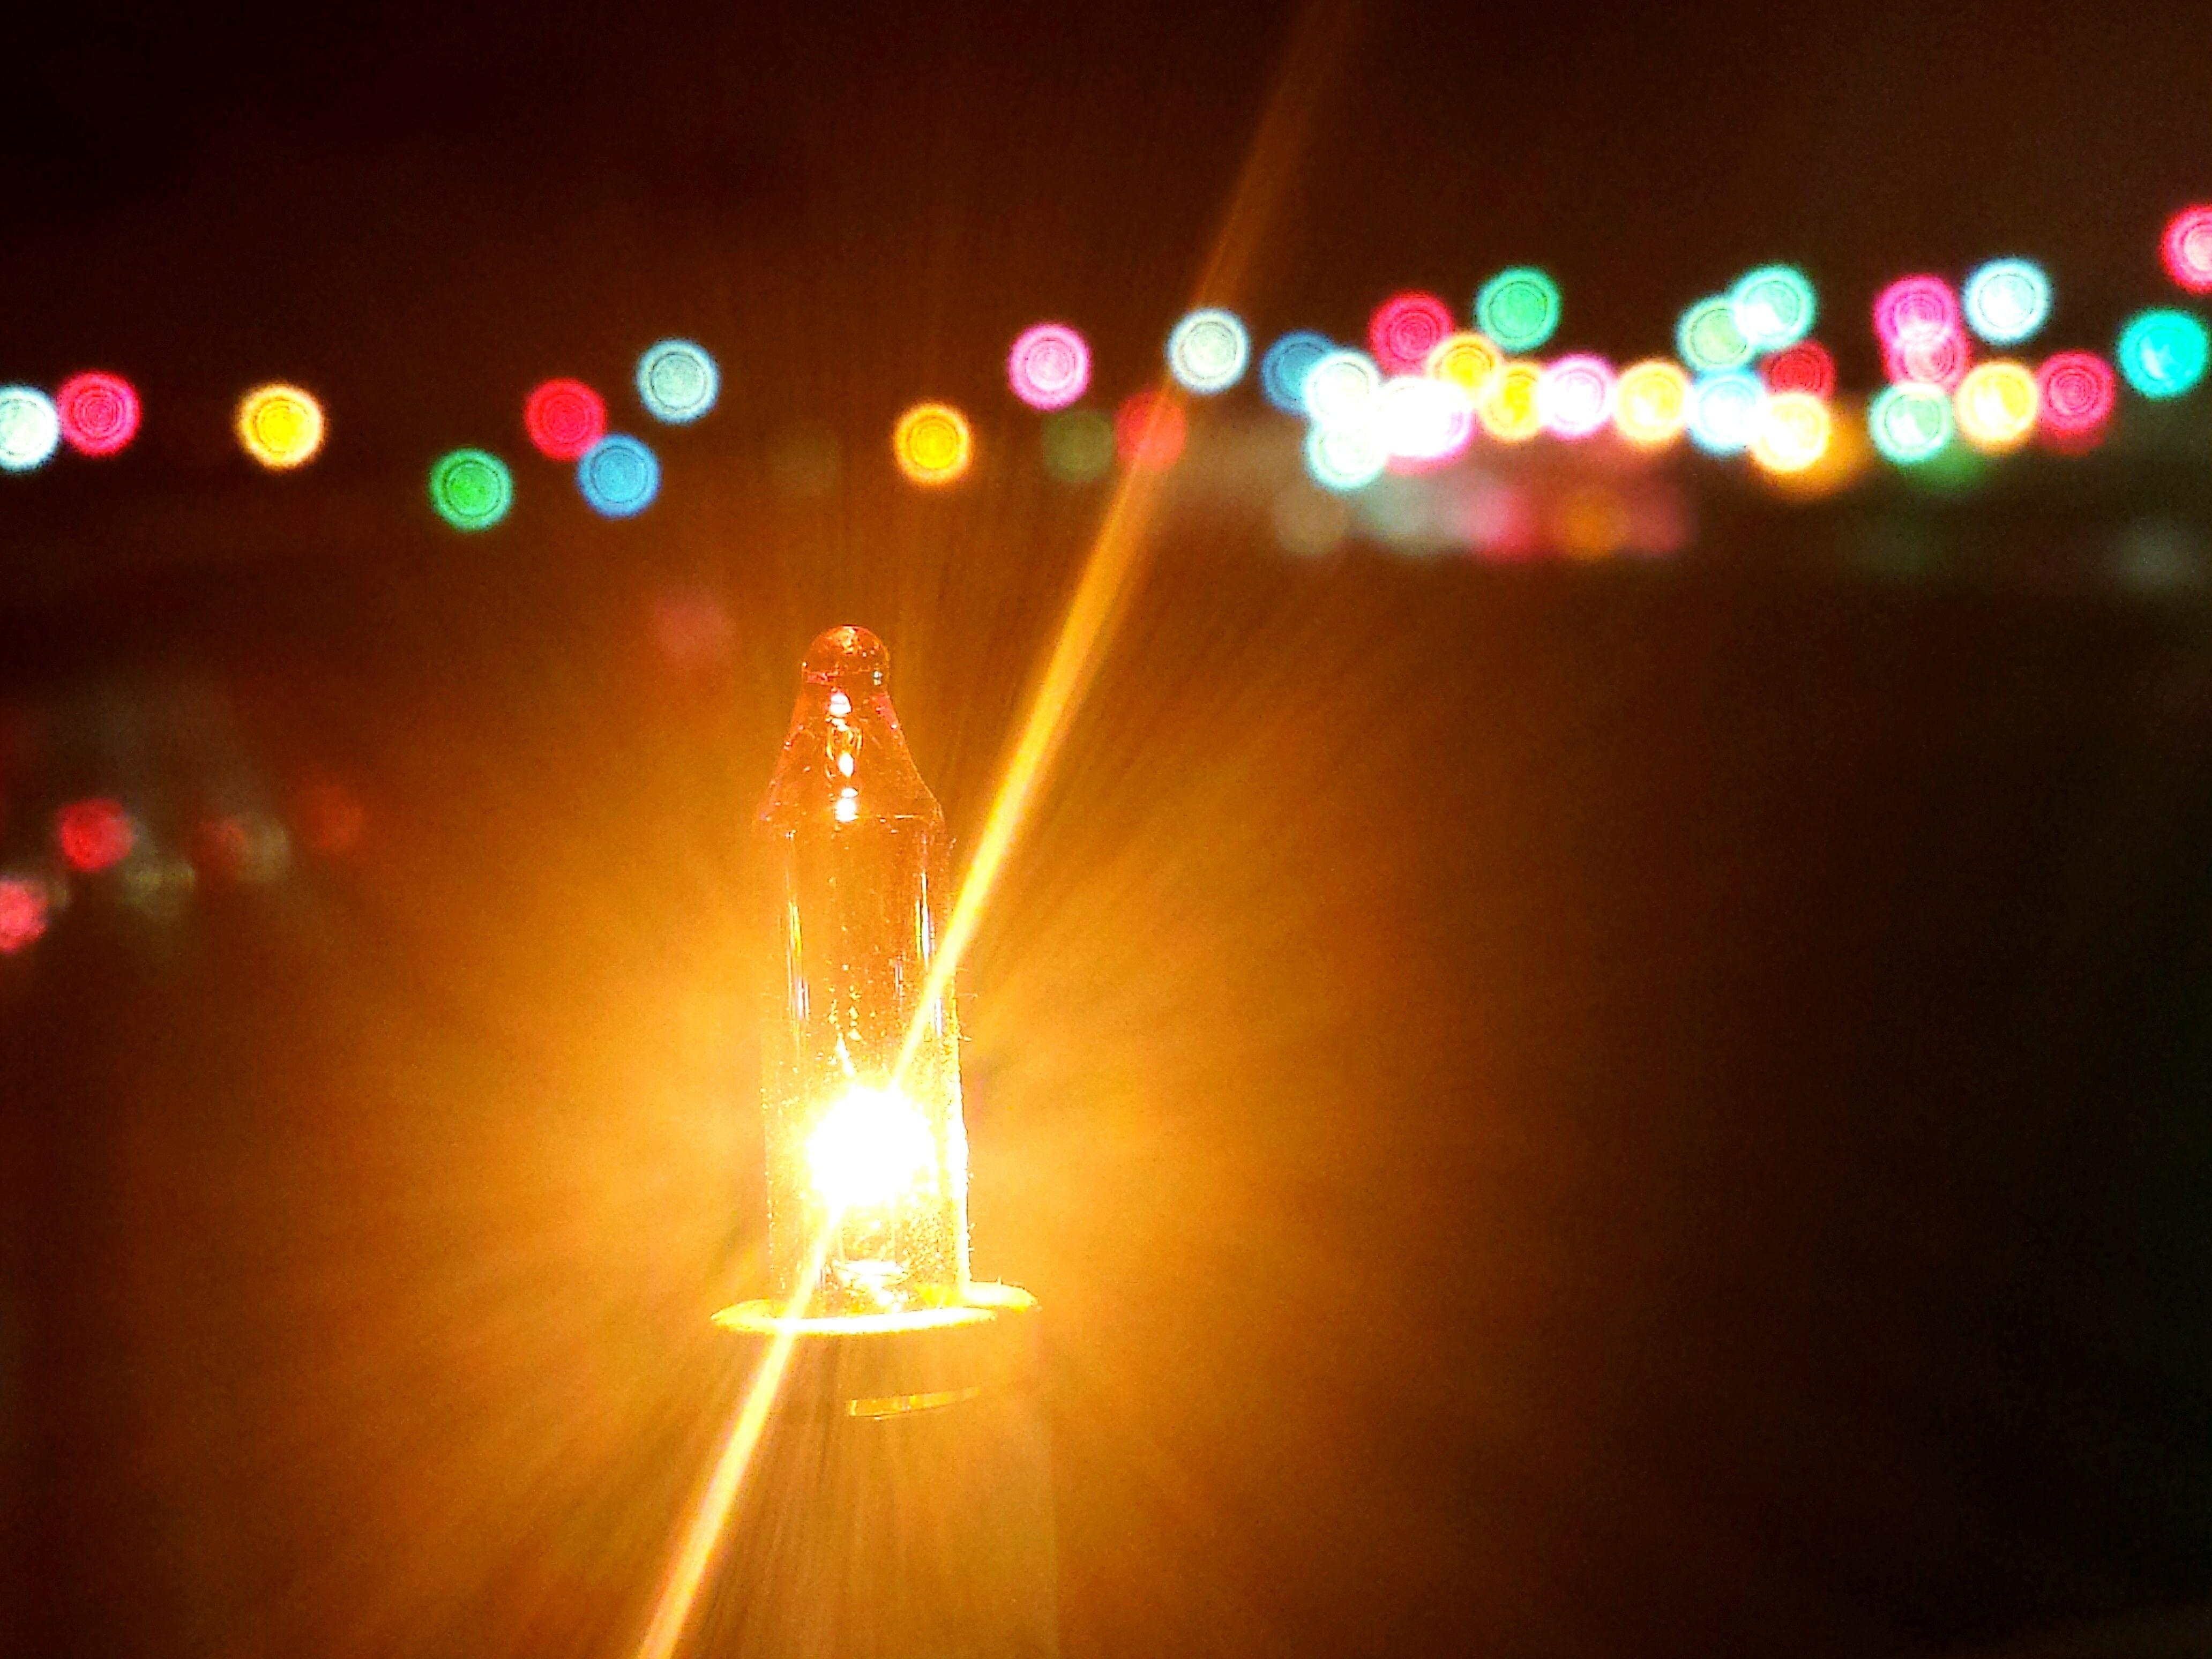 Brightest Led Christmas Lights